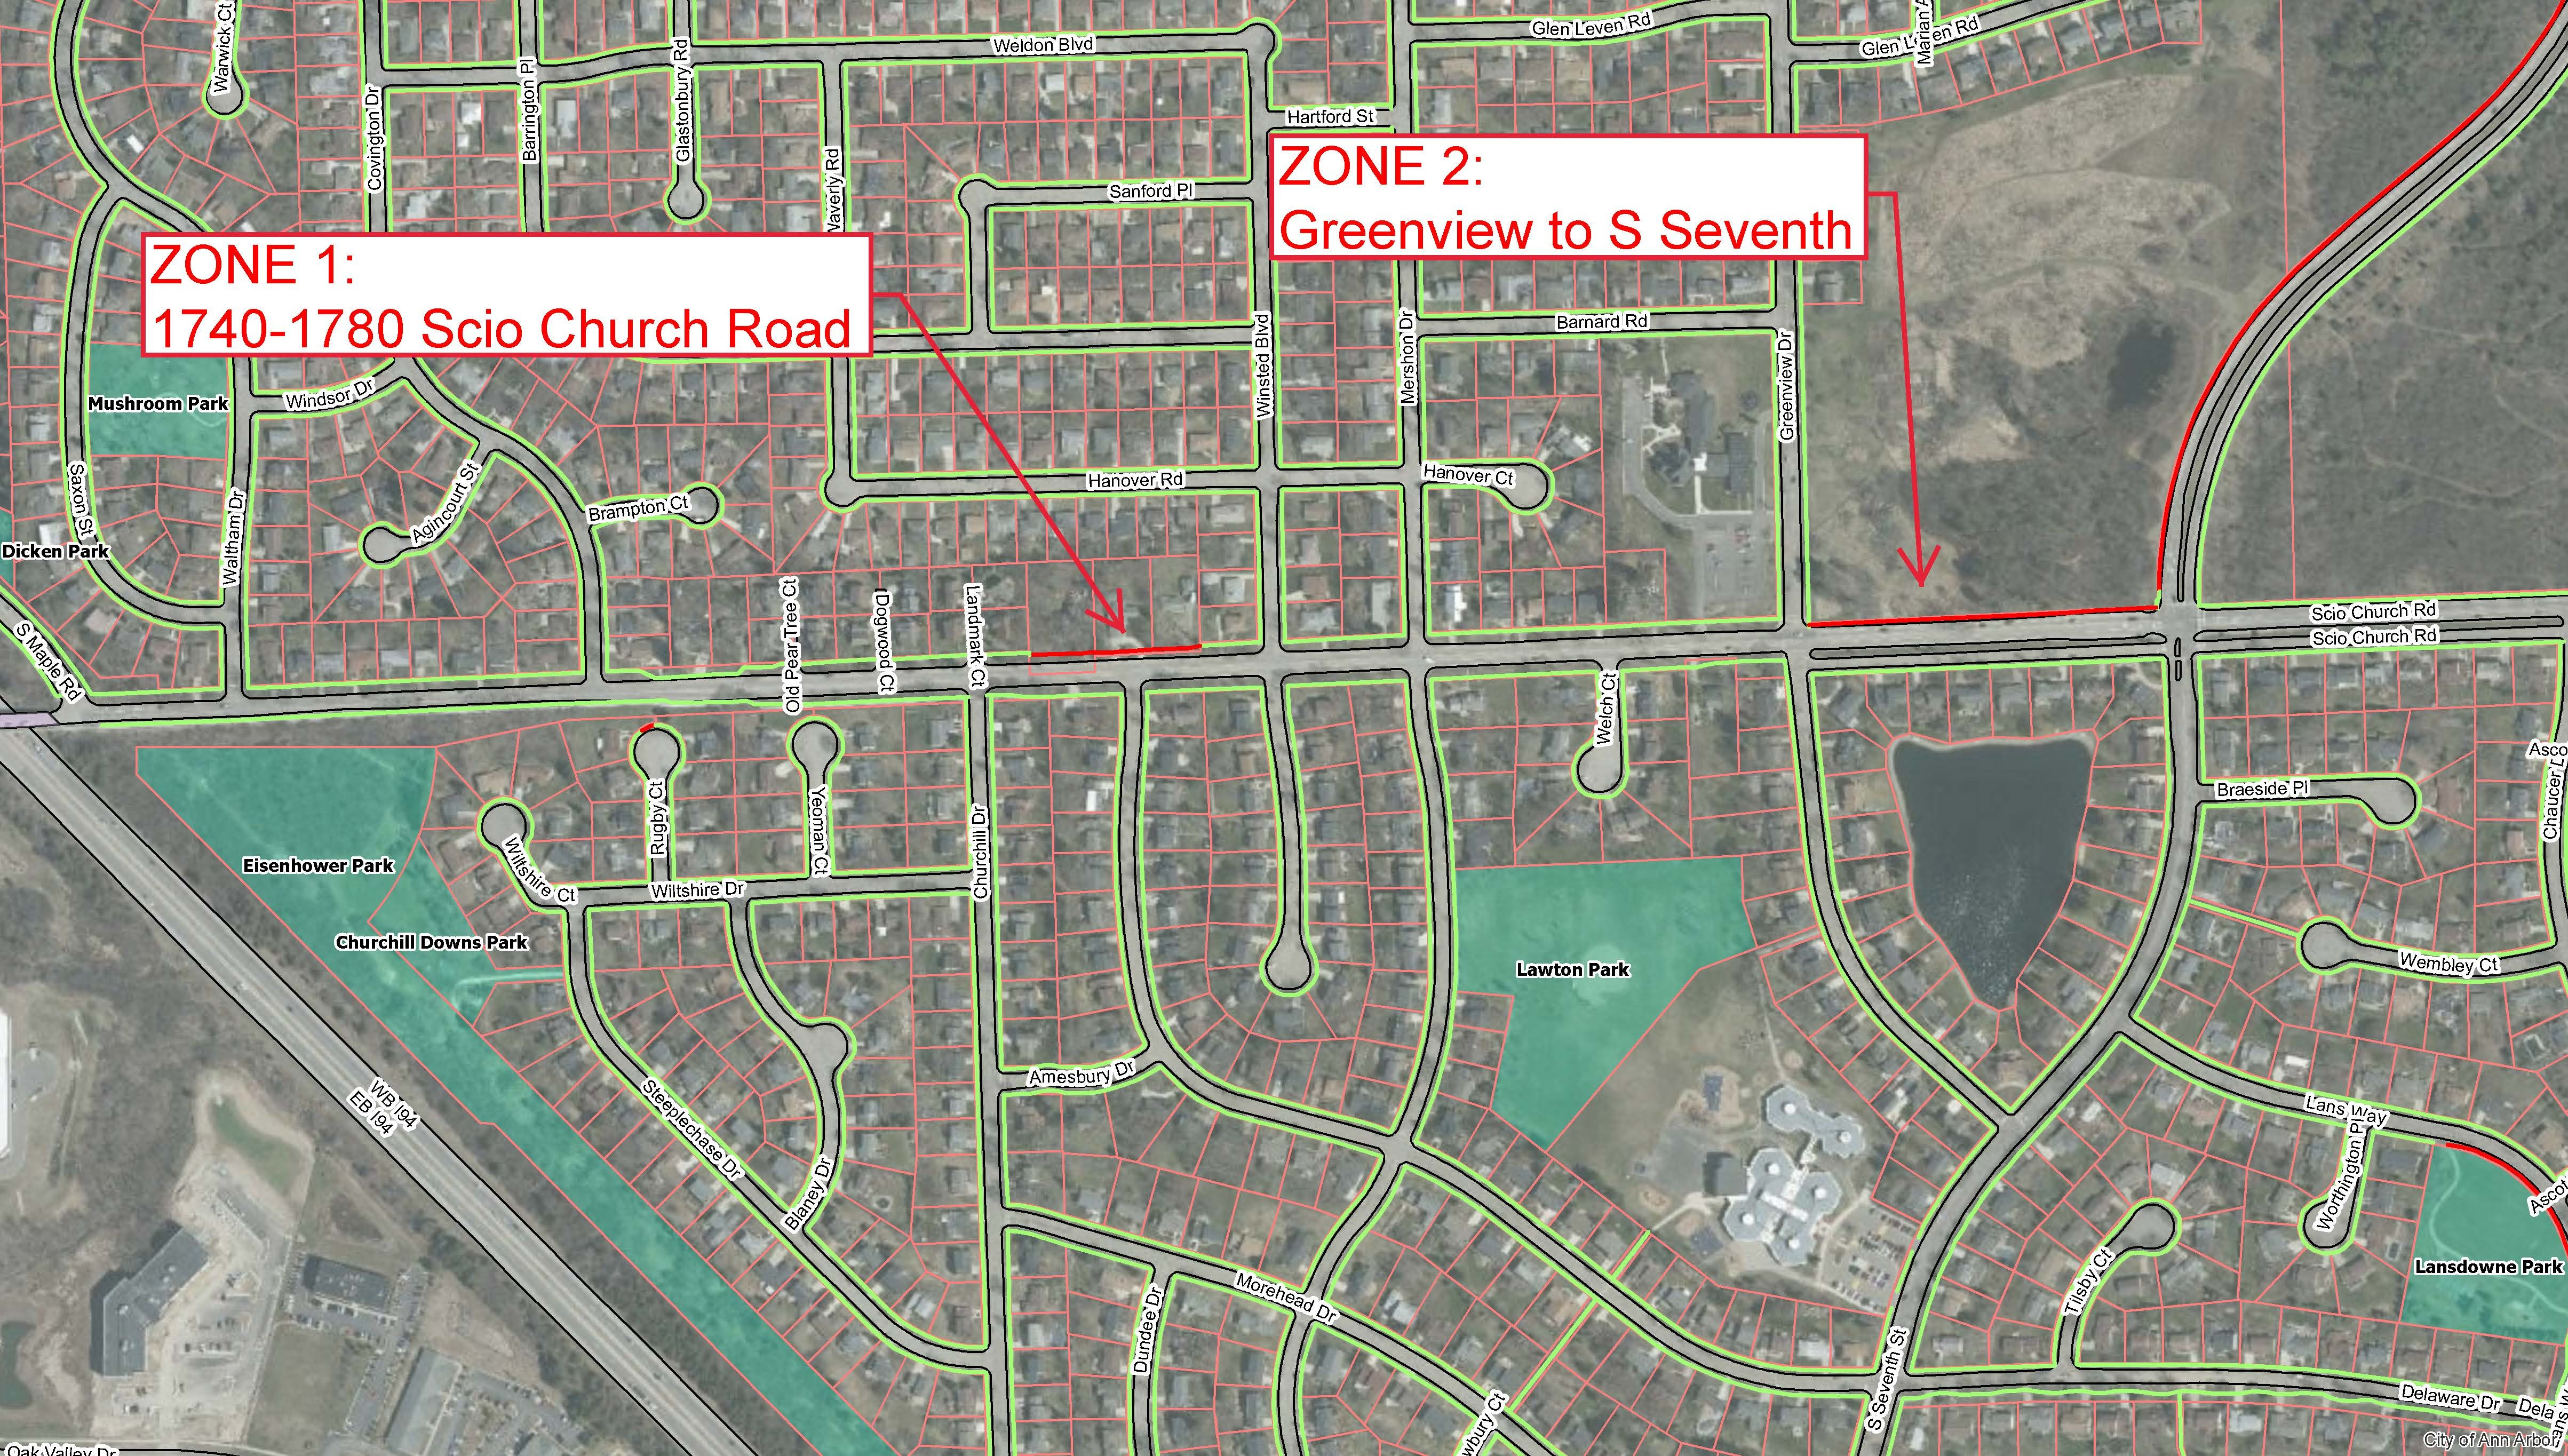 Sidewalk map d7a2a7db e443 4c1d aee2 593385af3e99